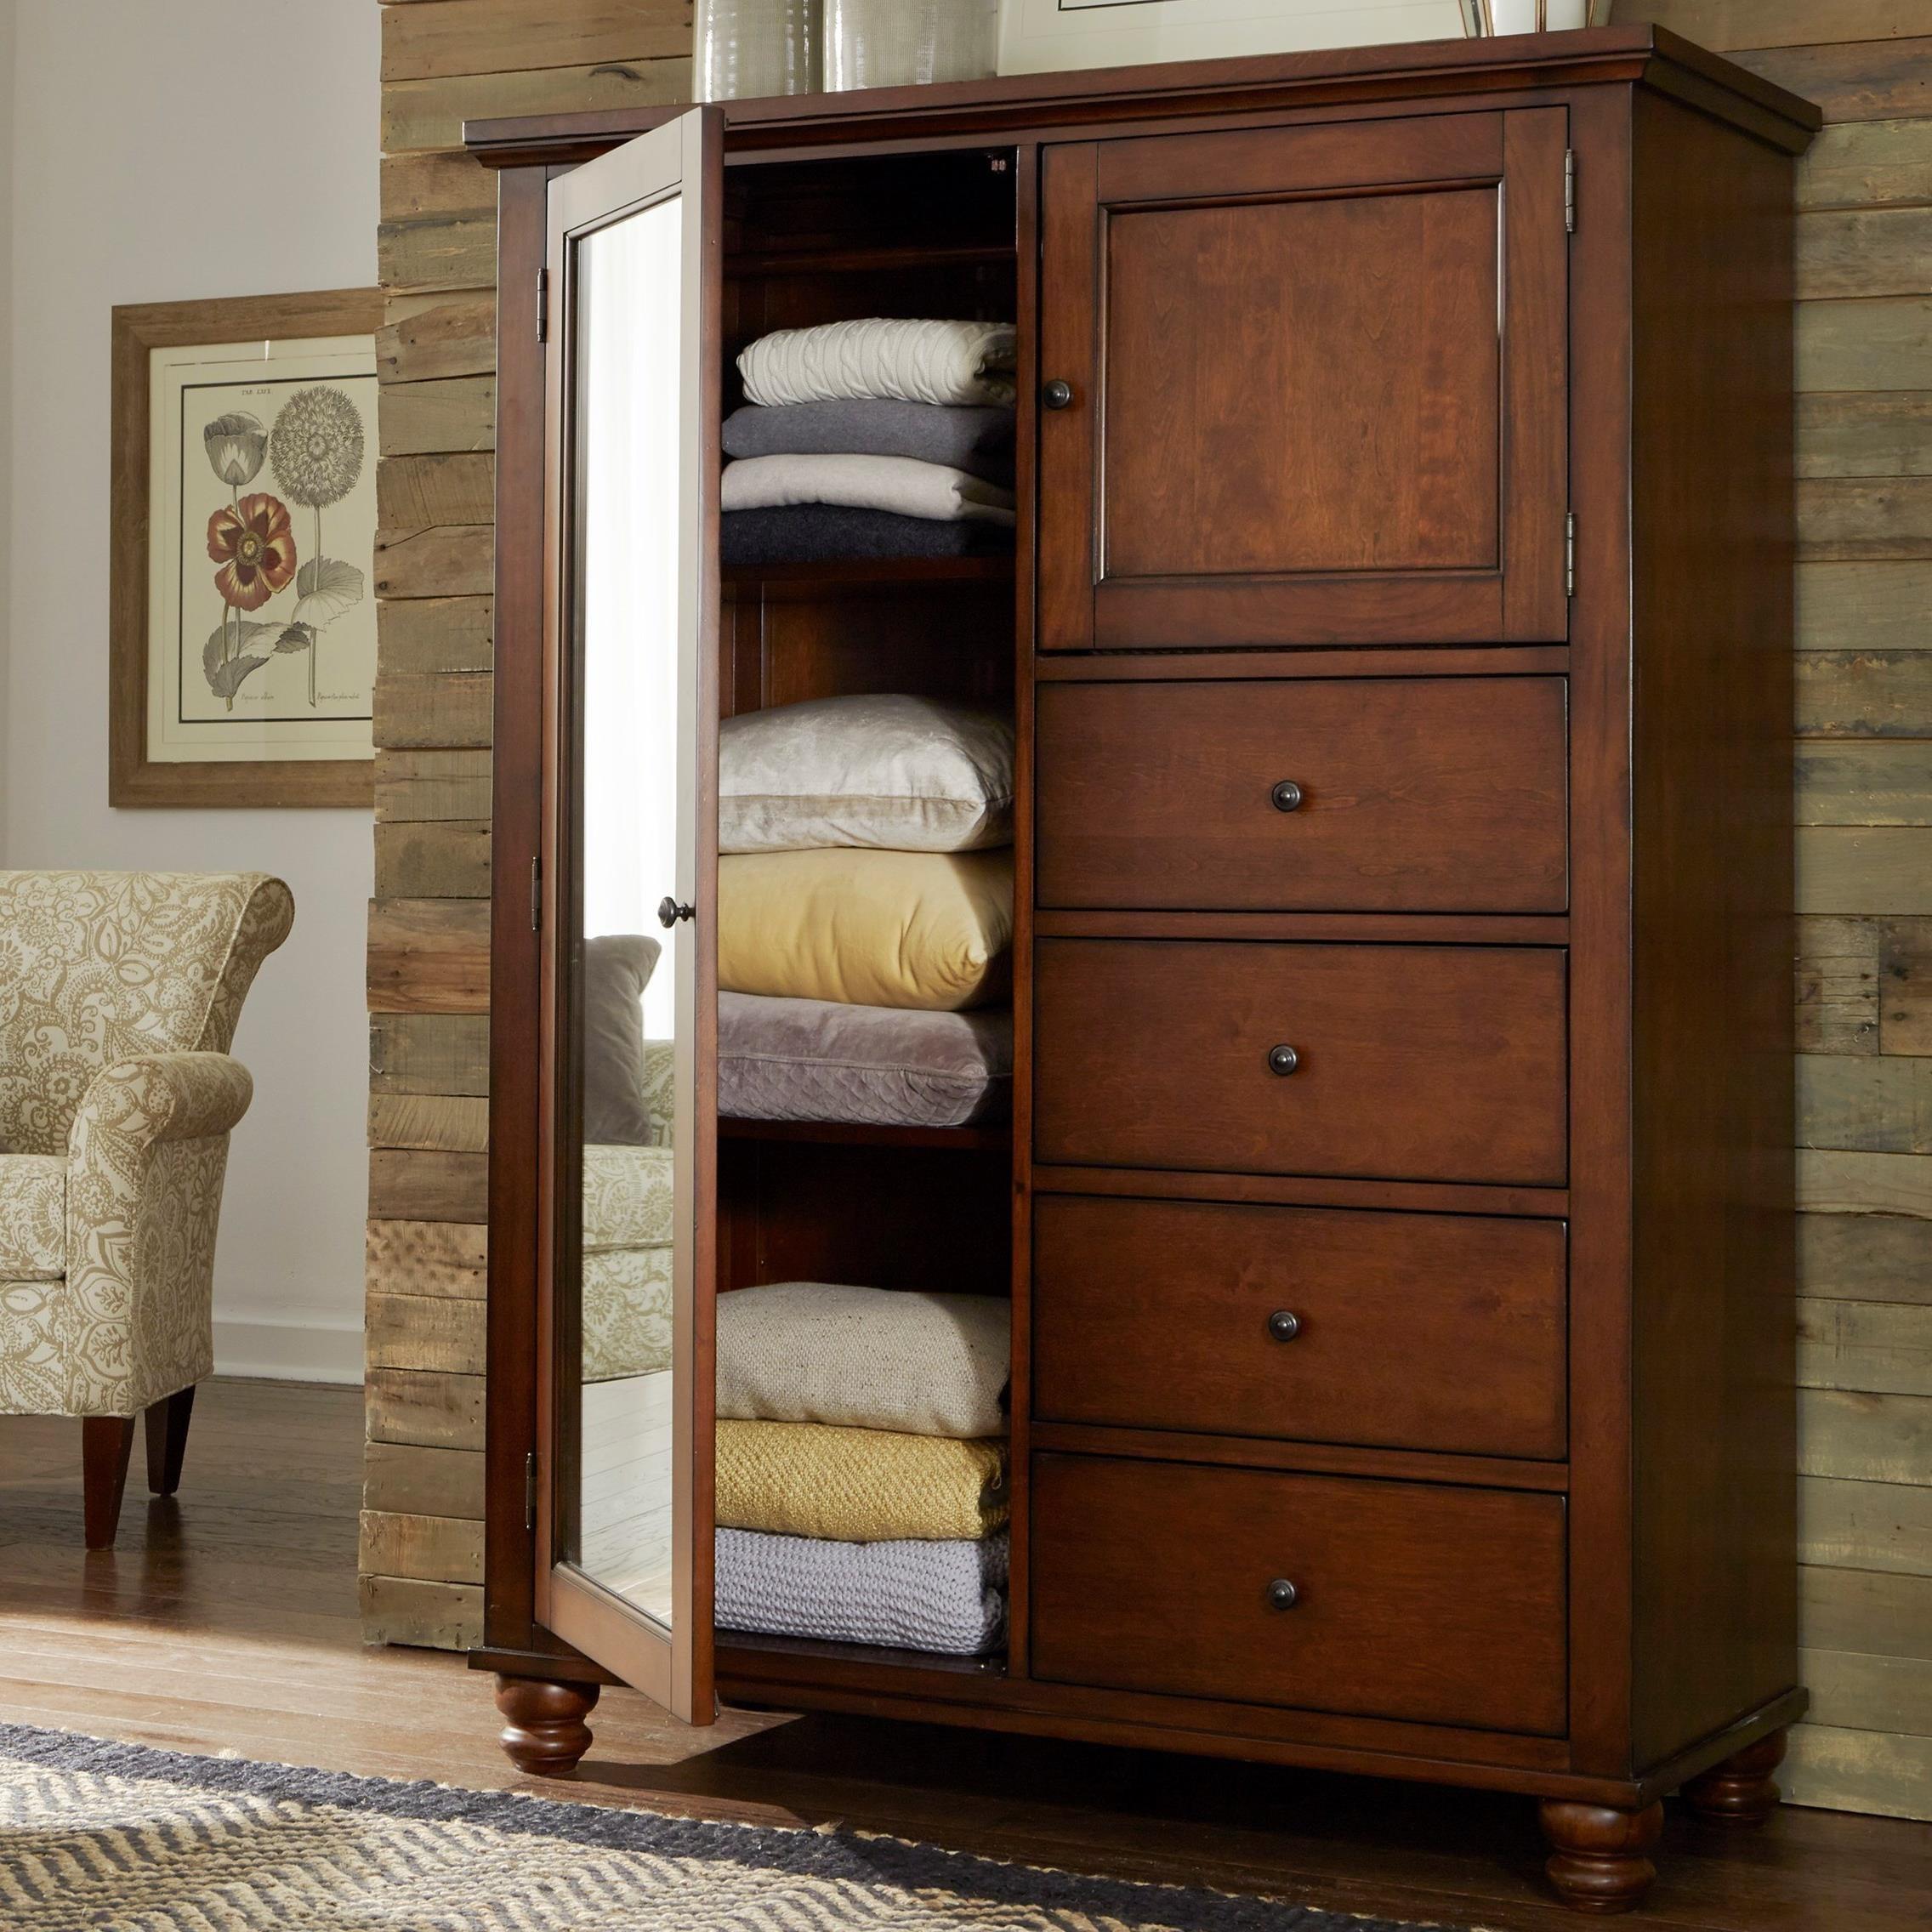 Cambridge 4 drawer 2 Door Chiffarobe  by Aspenhome at Stoney Creek Furniture